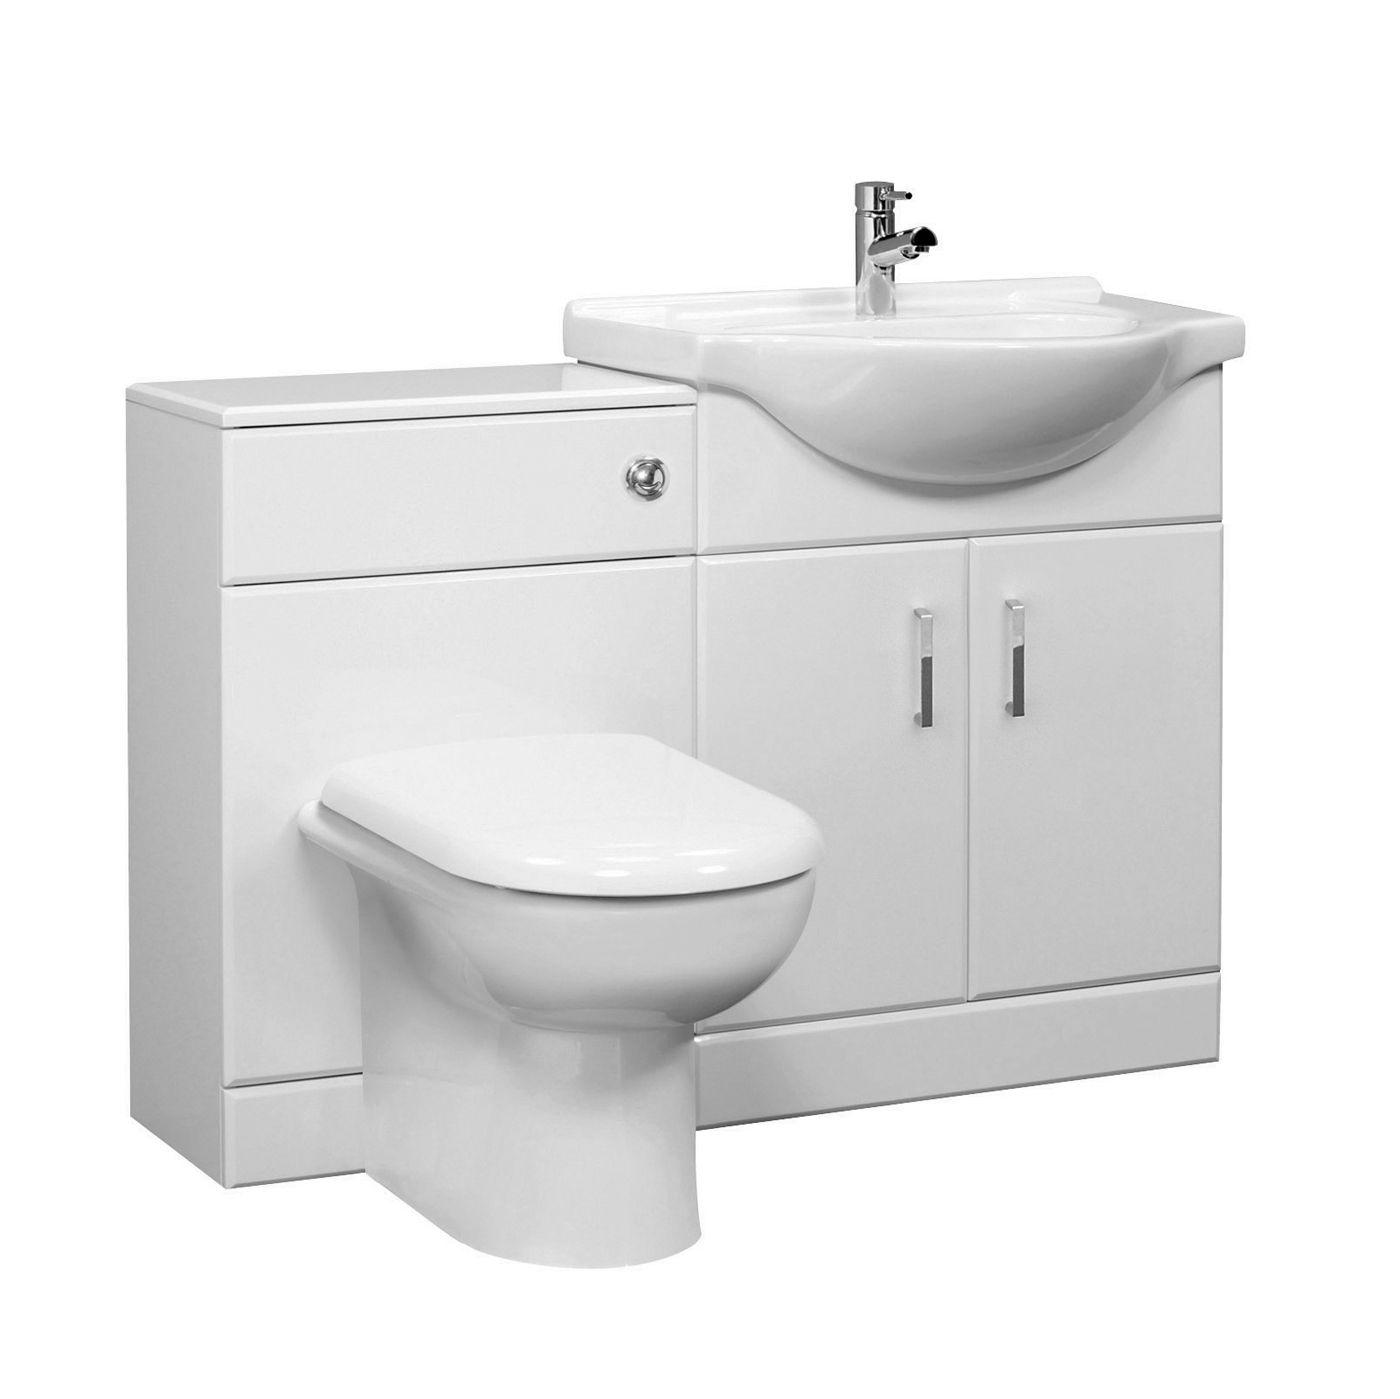 White Bromley Furniture Pack - Image 1   Bathroom   Pinterest ...